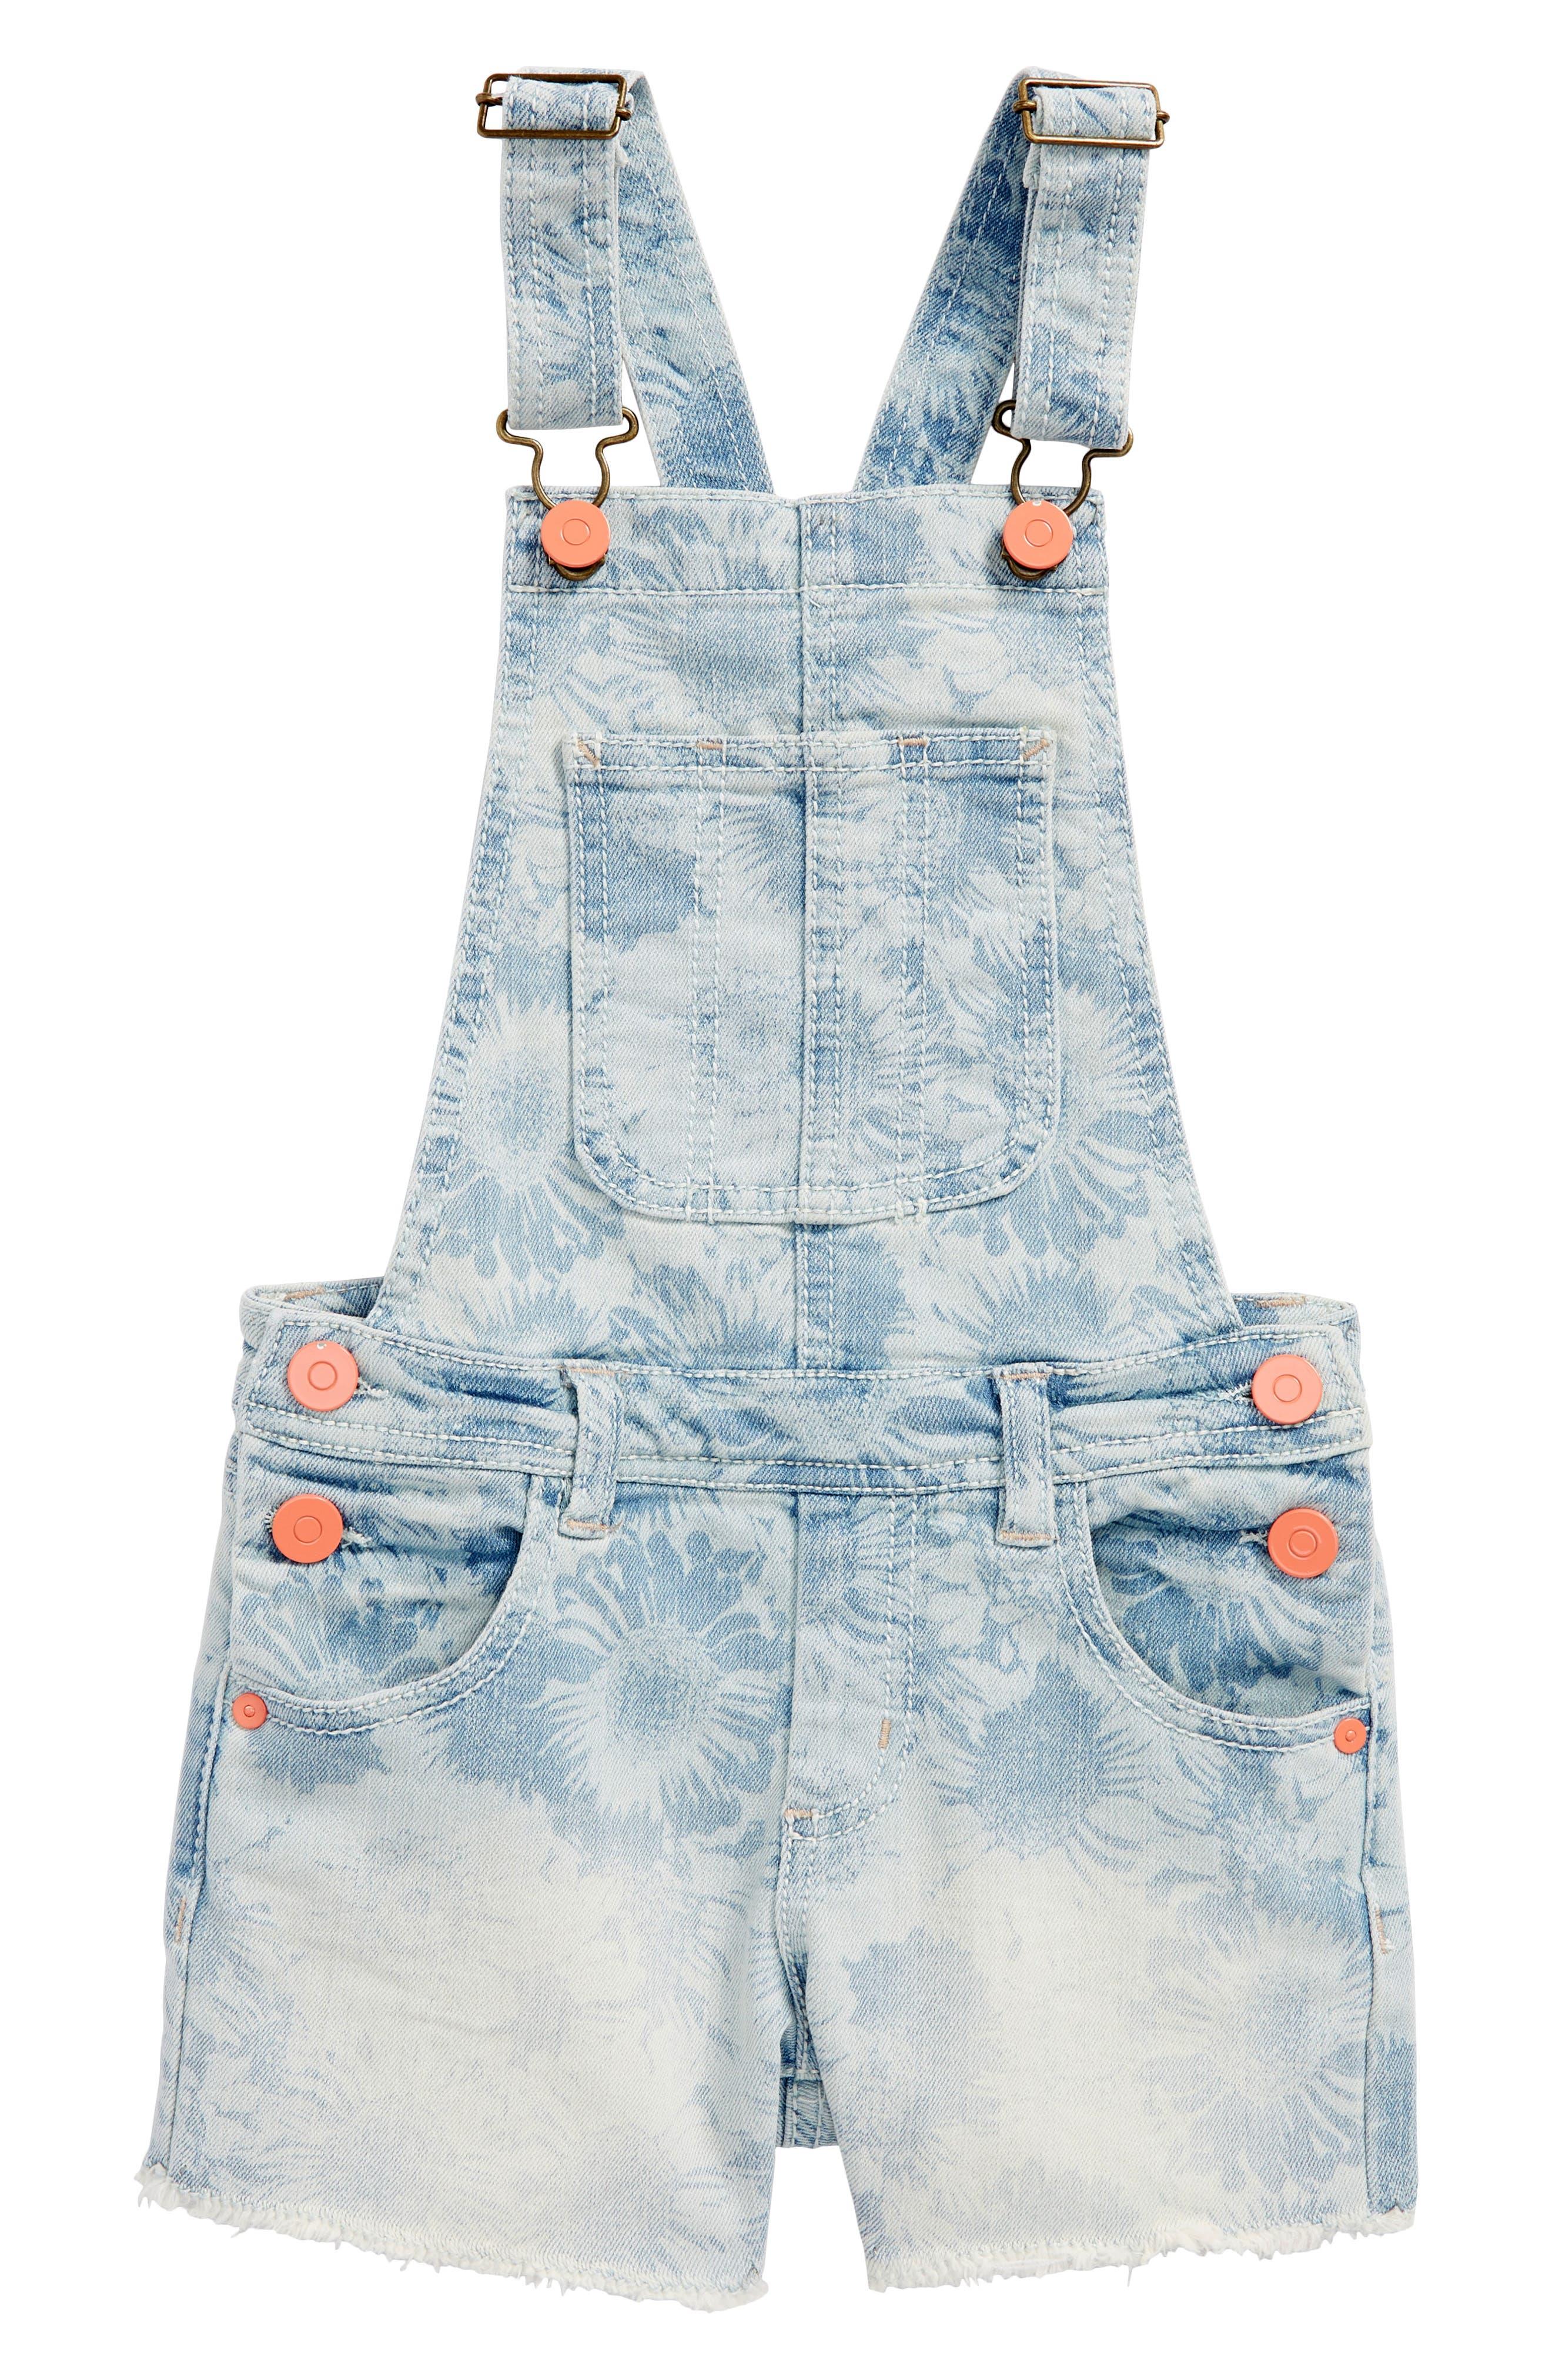 Daisy Cutoff Short Overalls,                         Main,                         color,